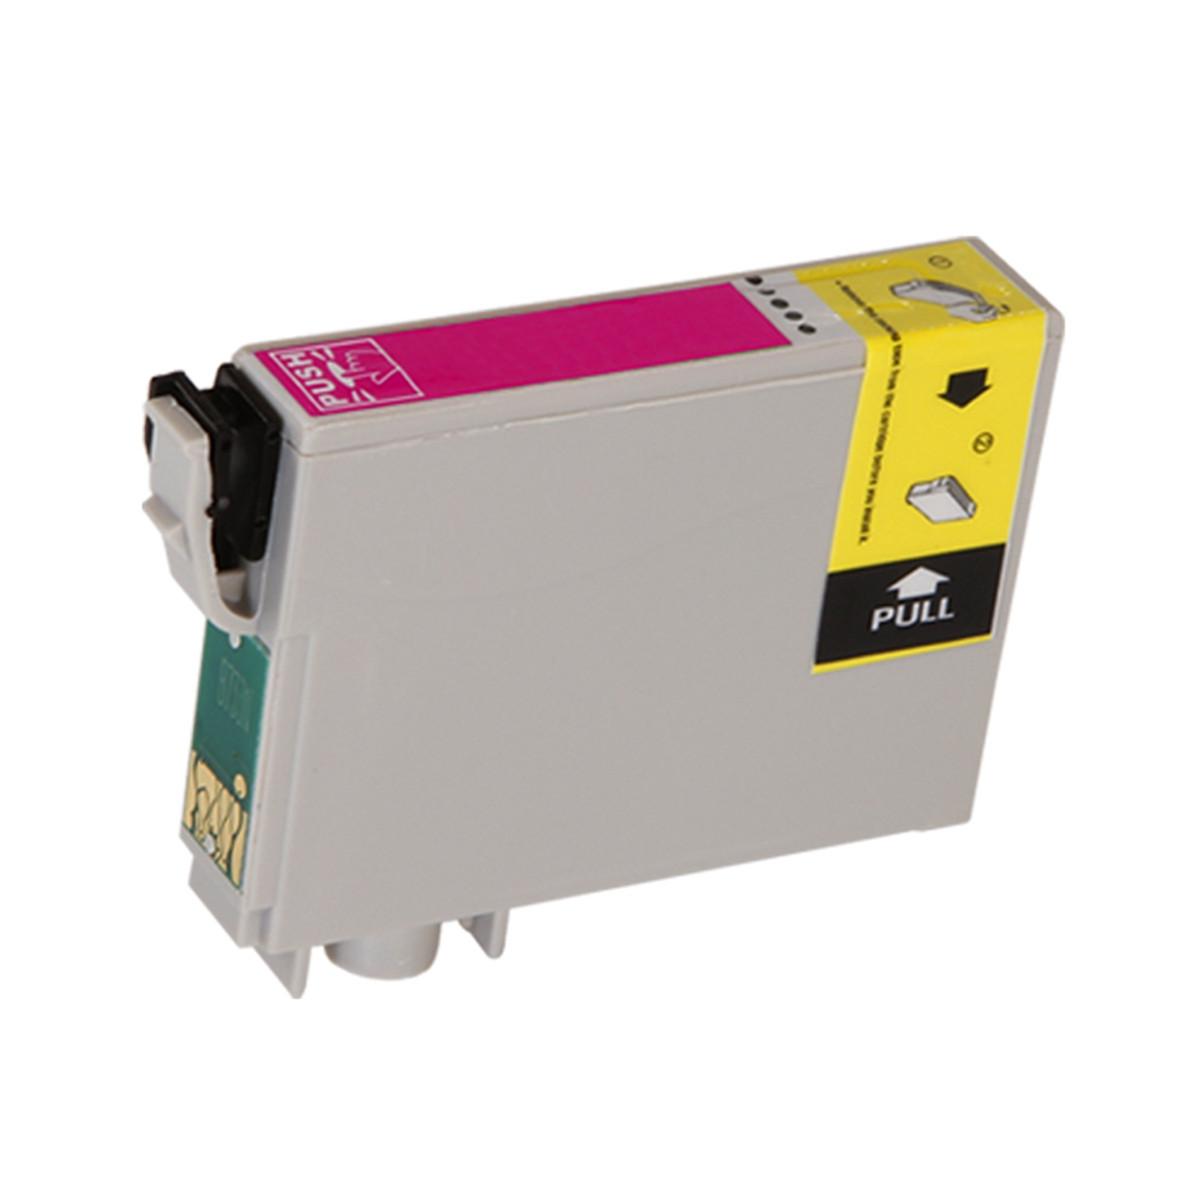 Cartucho de Tinta Epson T063320 T0633 T063 Magenta | CX3700 C67 CX7700 C87 | Compatível 12 ml